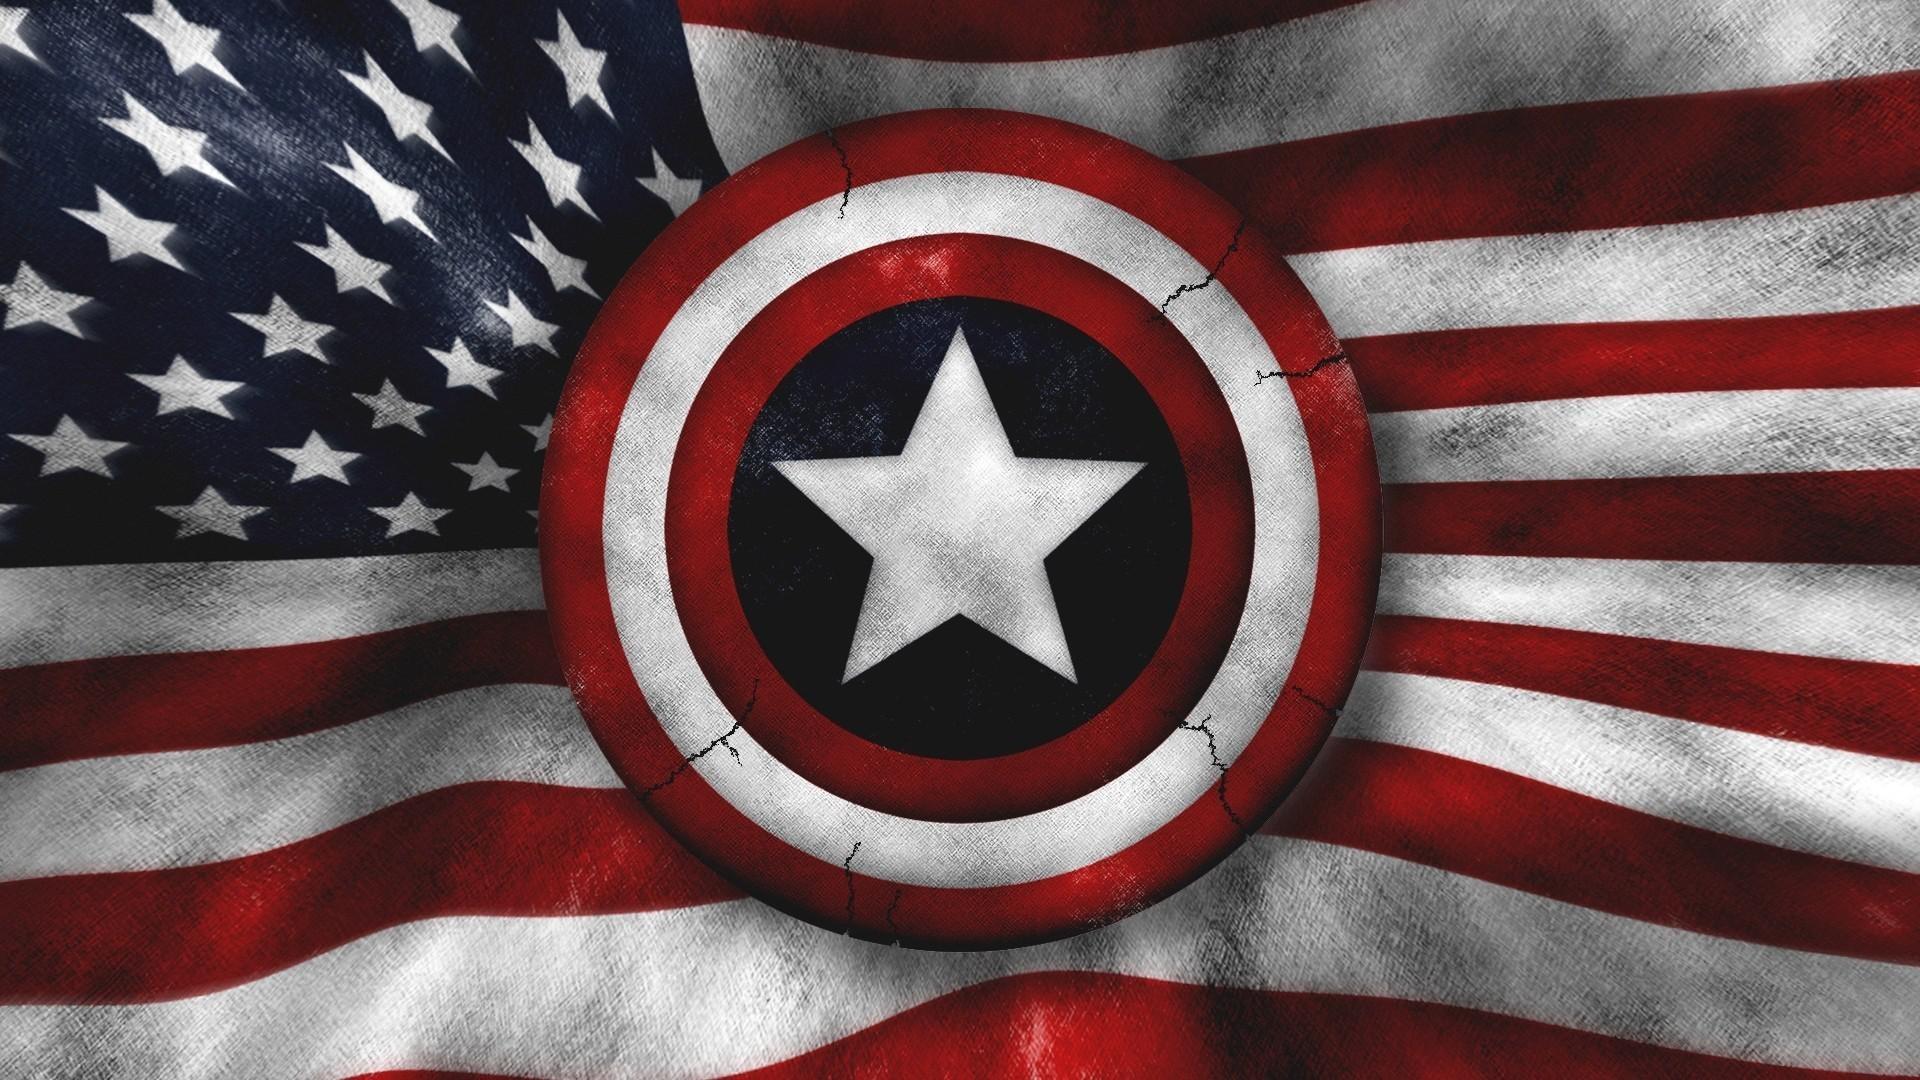 Res: 1920x1080, Download V.155 - USA Flag Wallpaper HD, ModaF.com